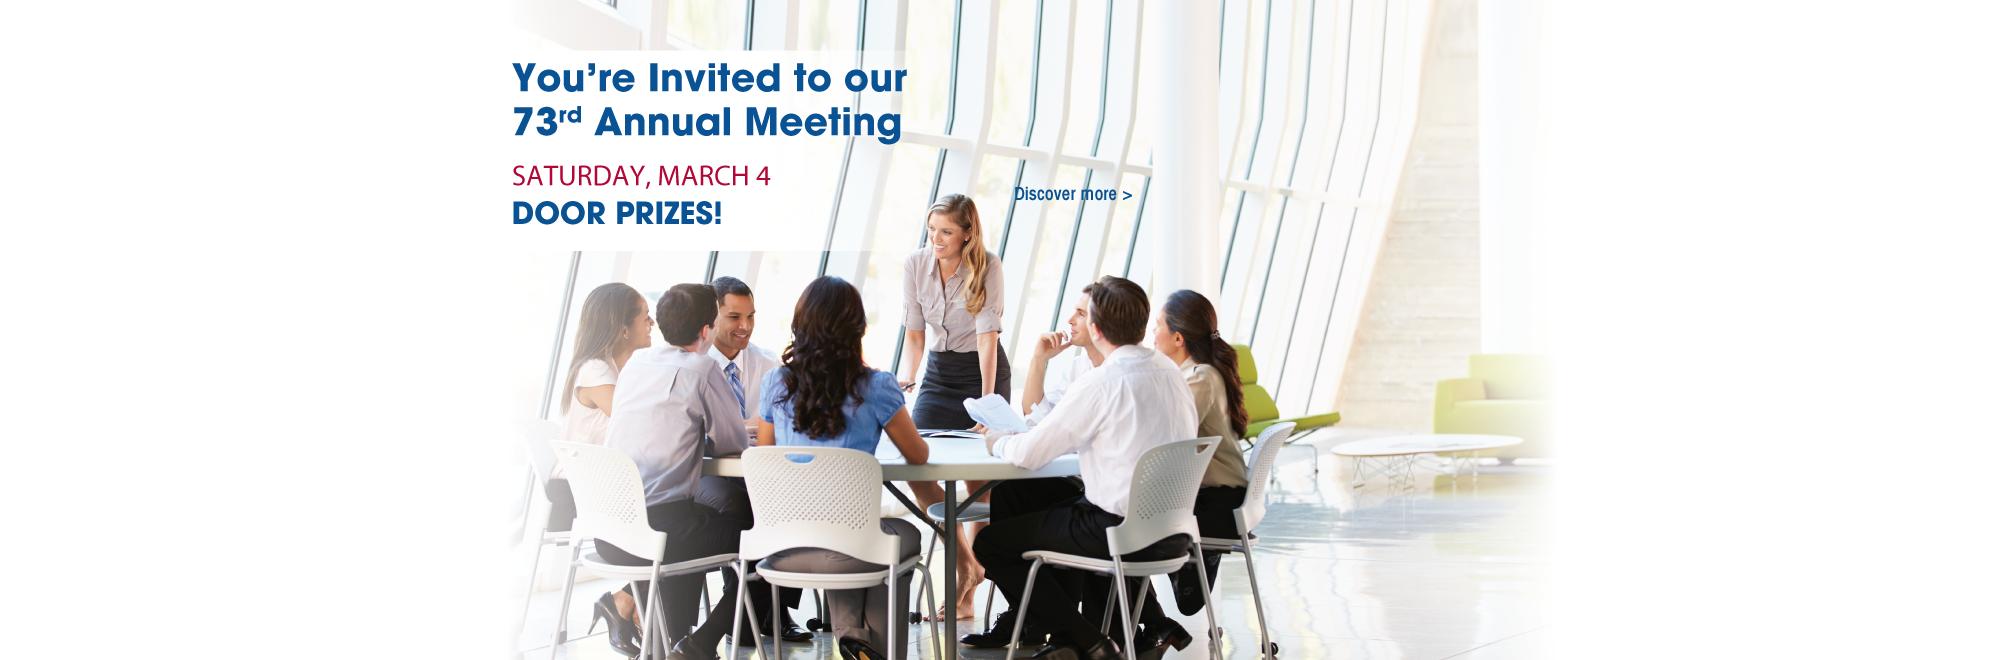 73rd Annual Meeting